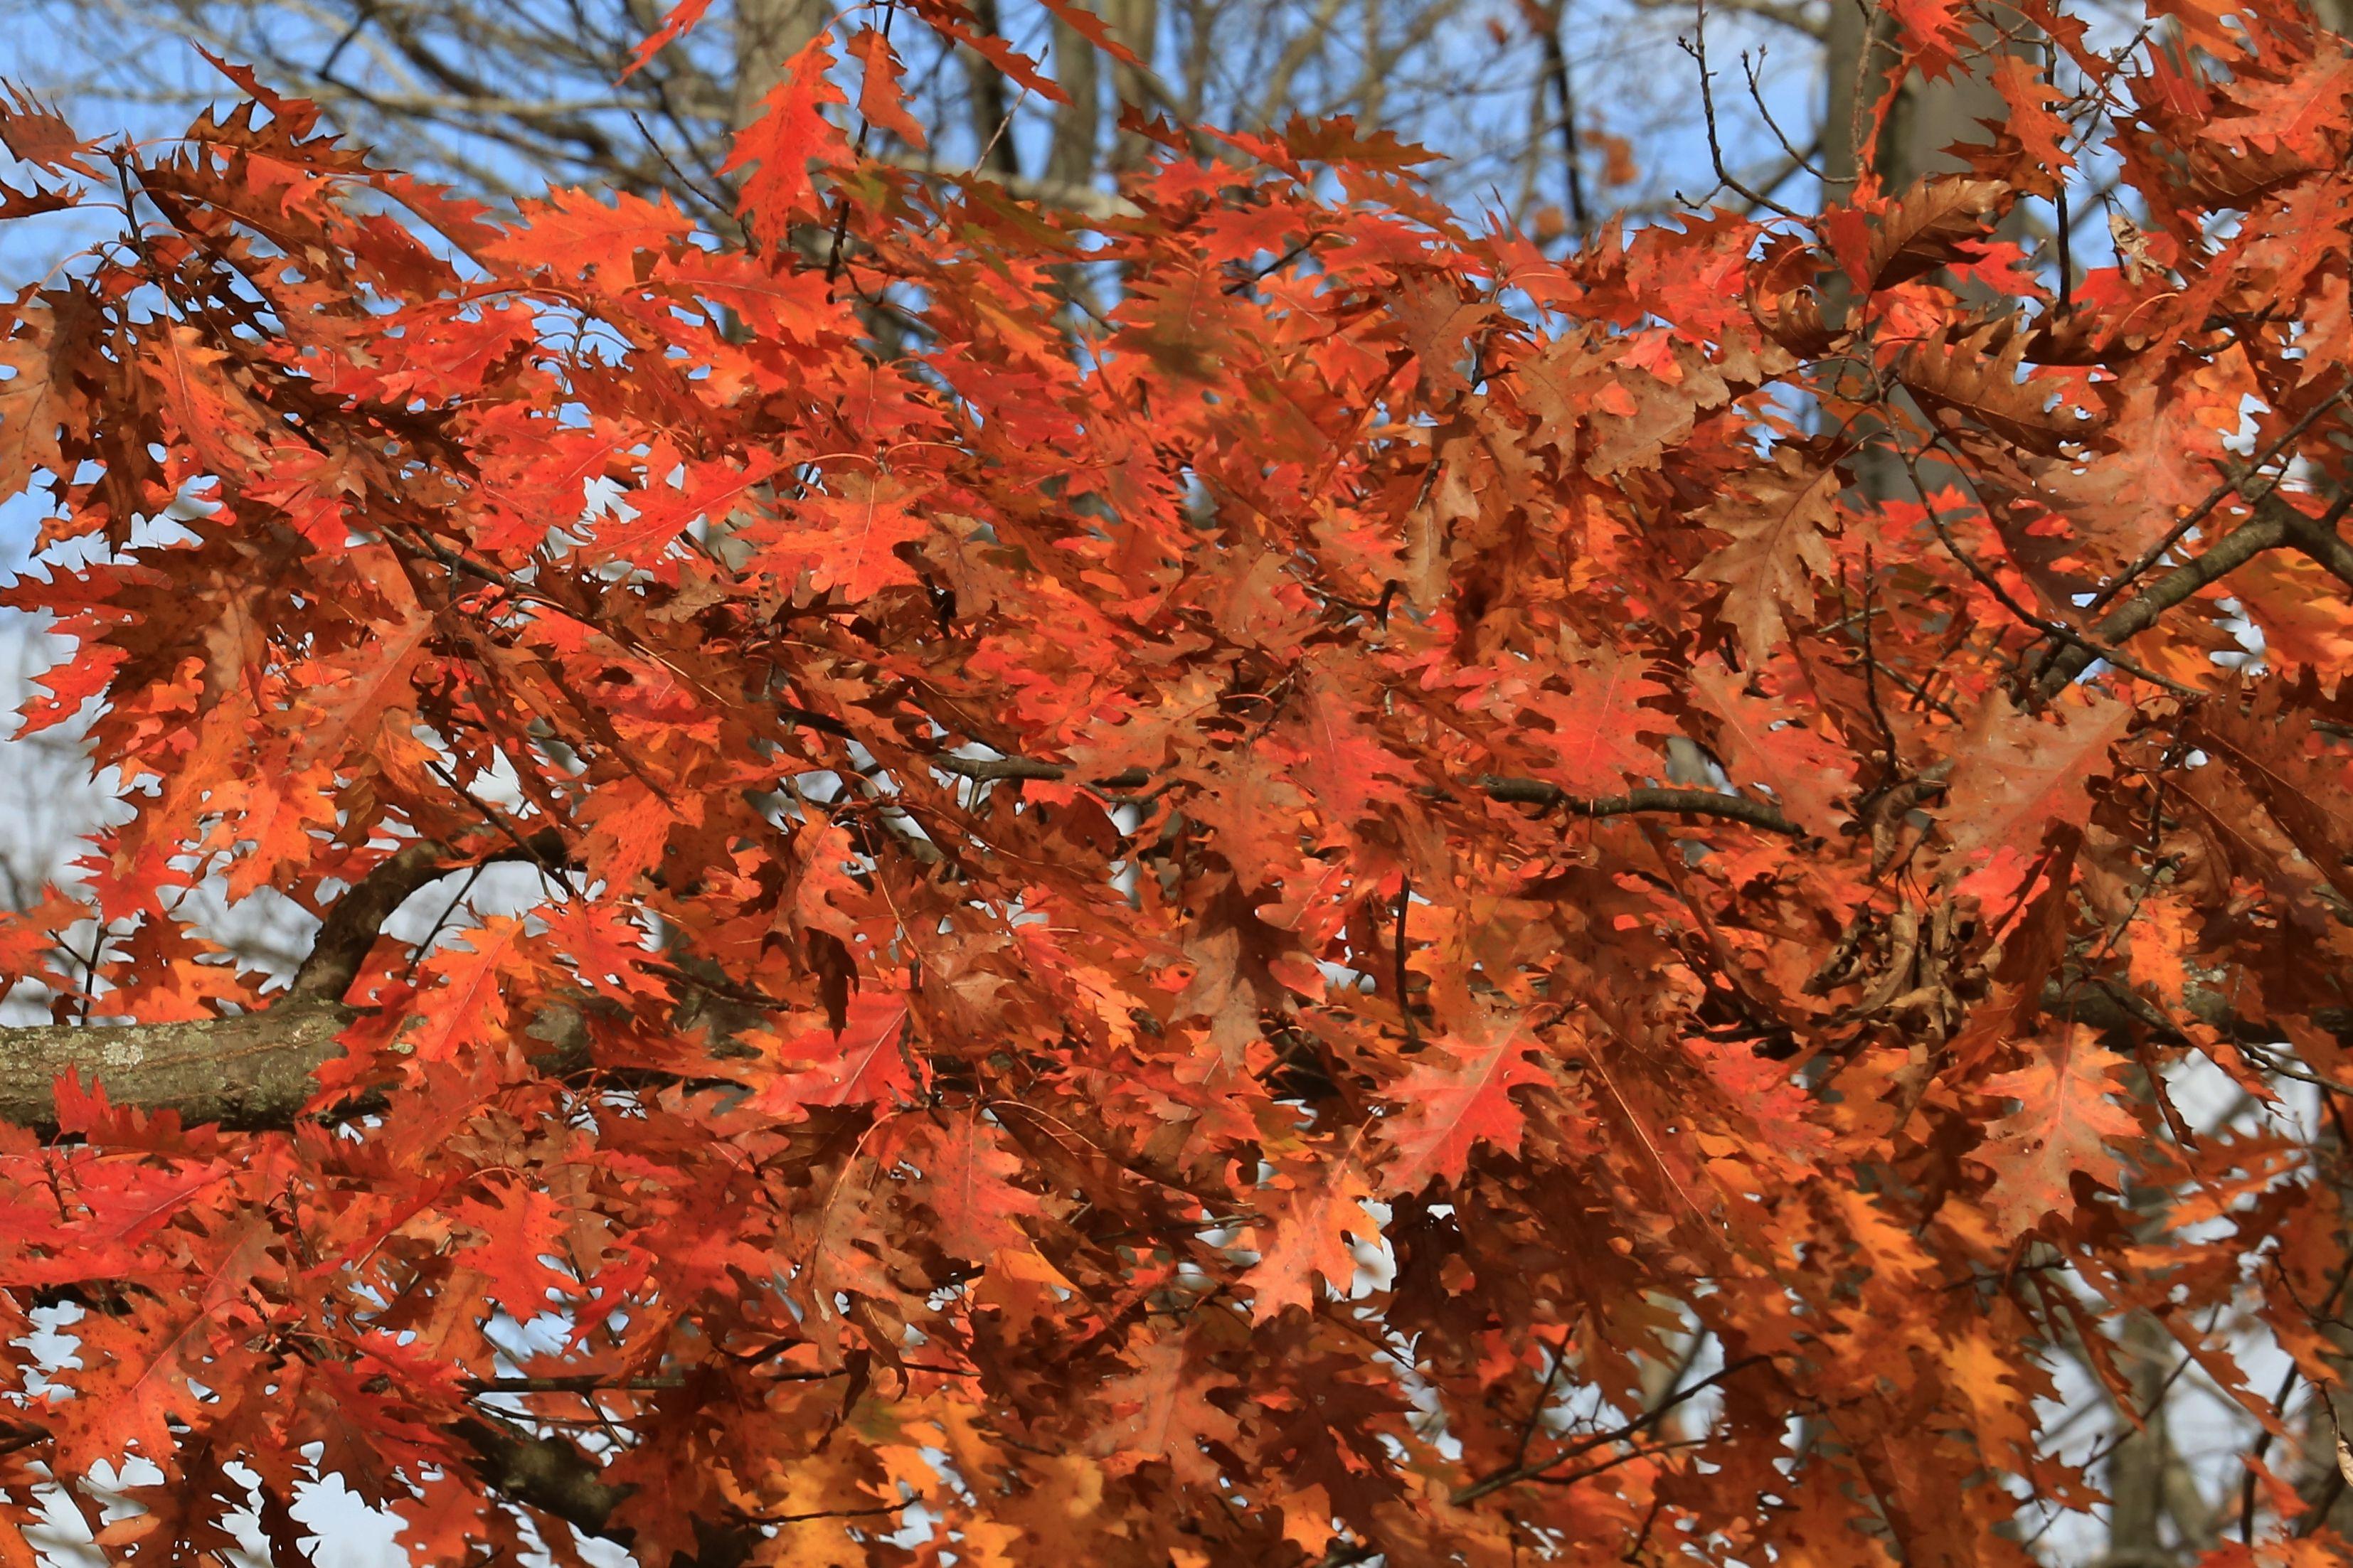 Grow Red Oak Trees for Late Fall Foliage